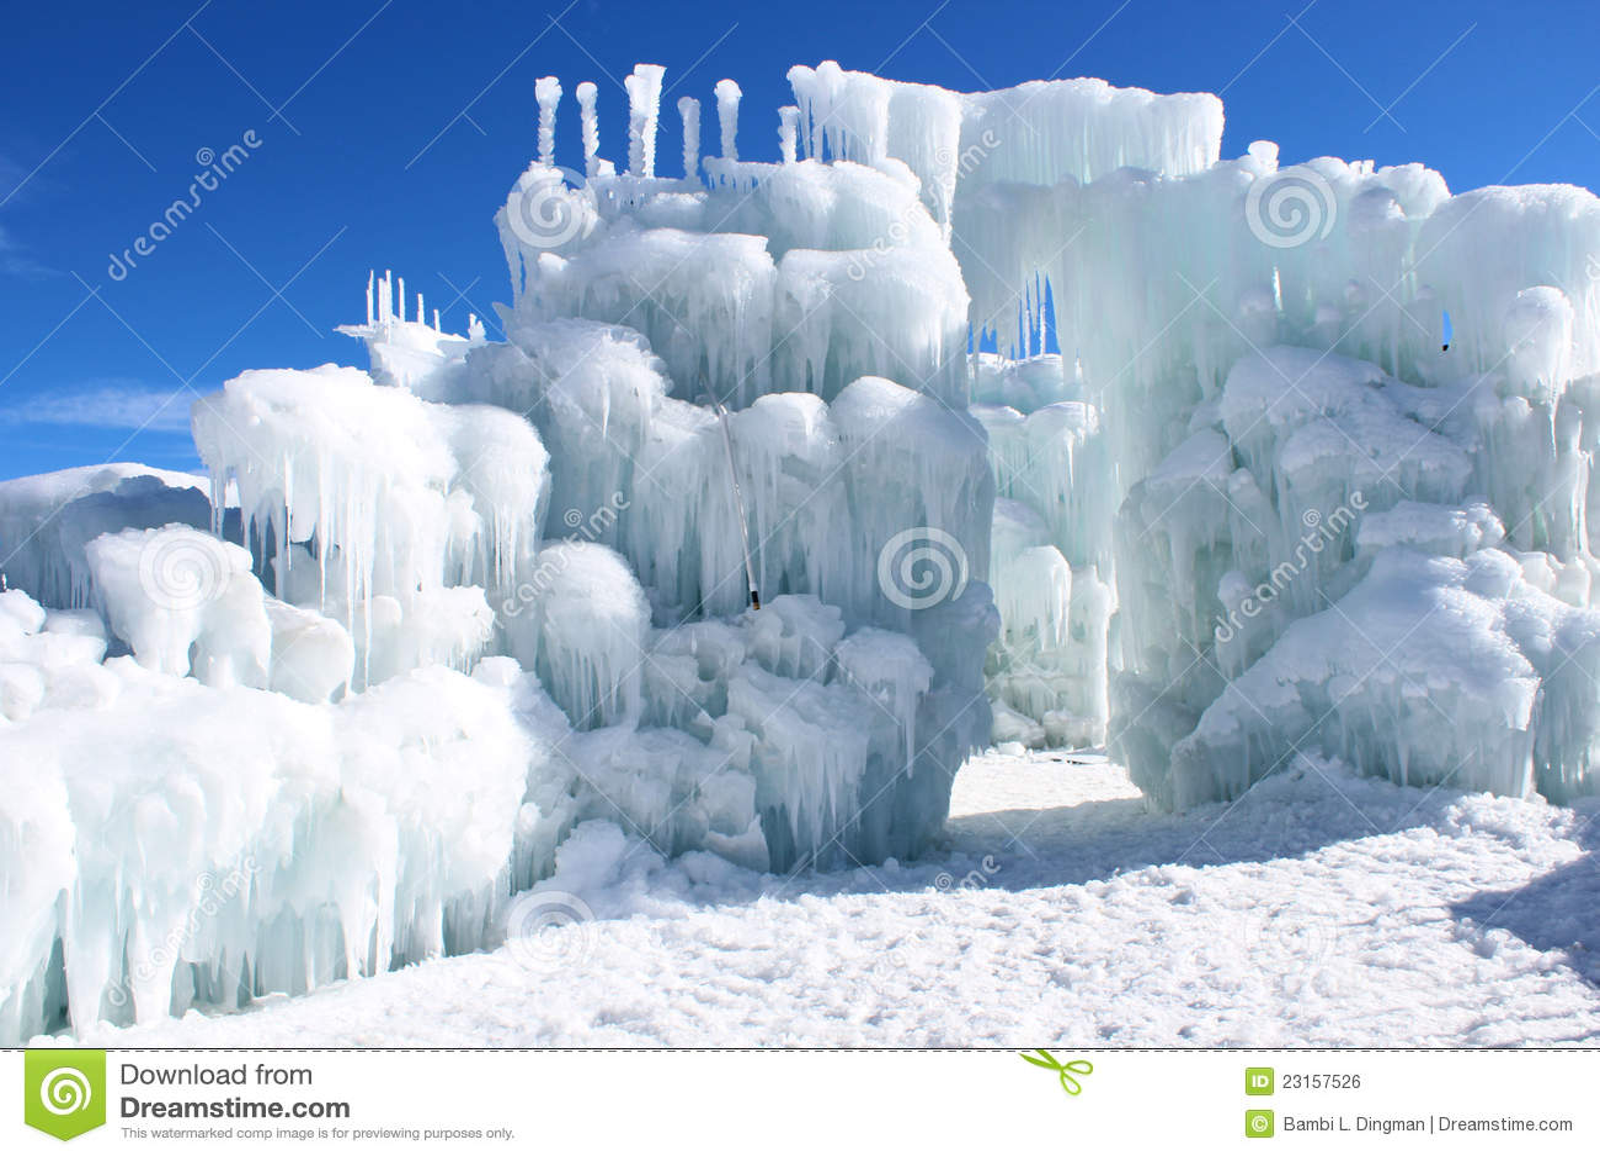 Silverthorne Ice Castles